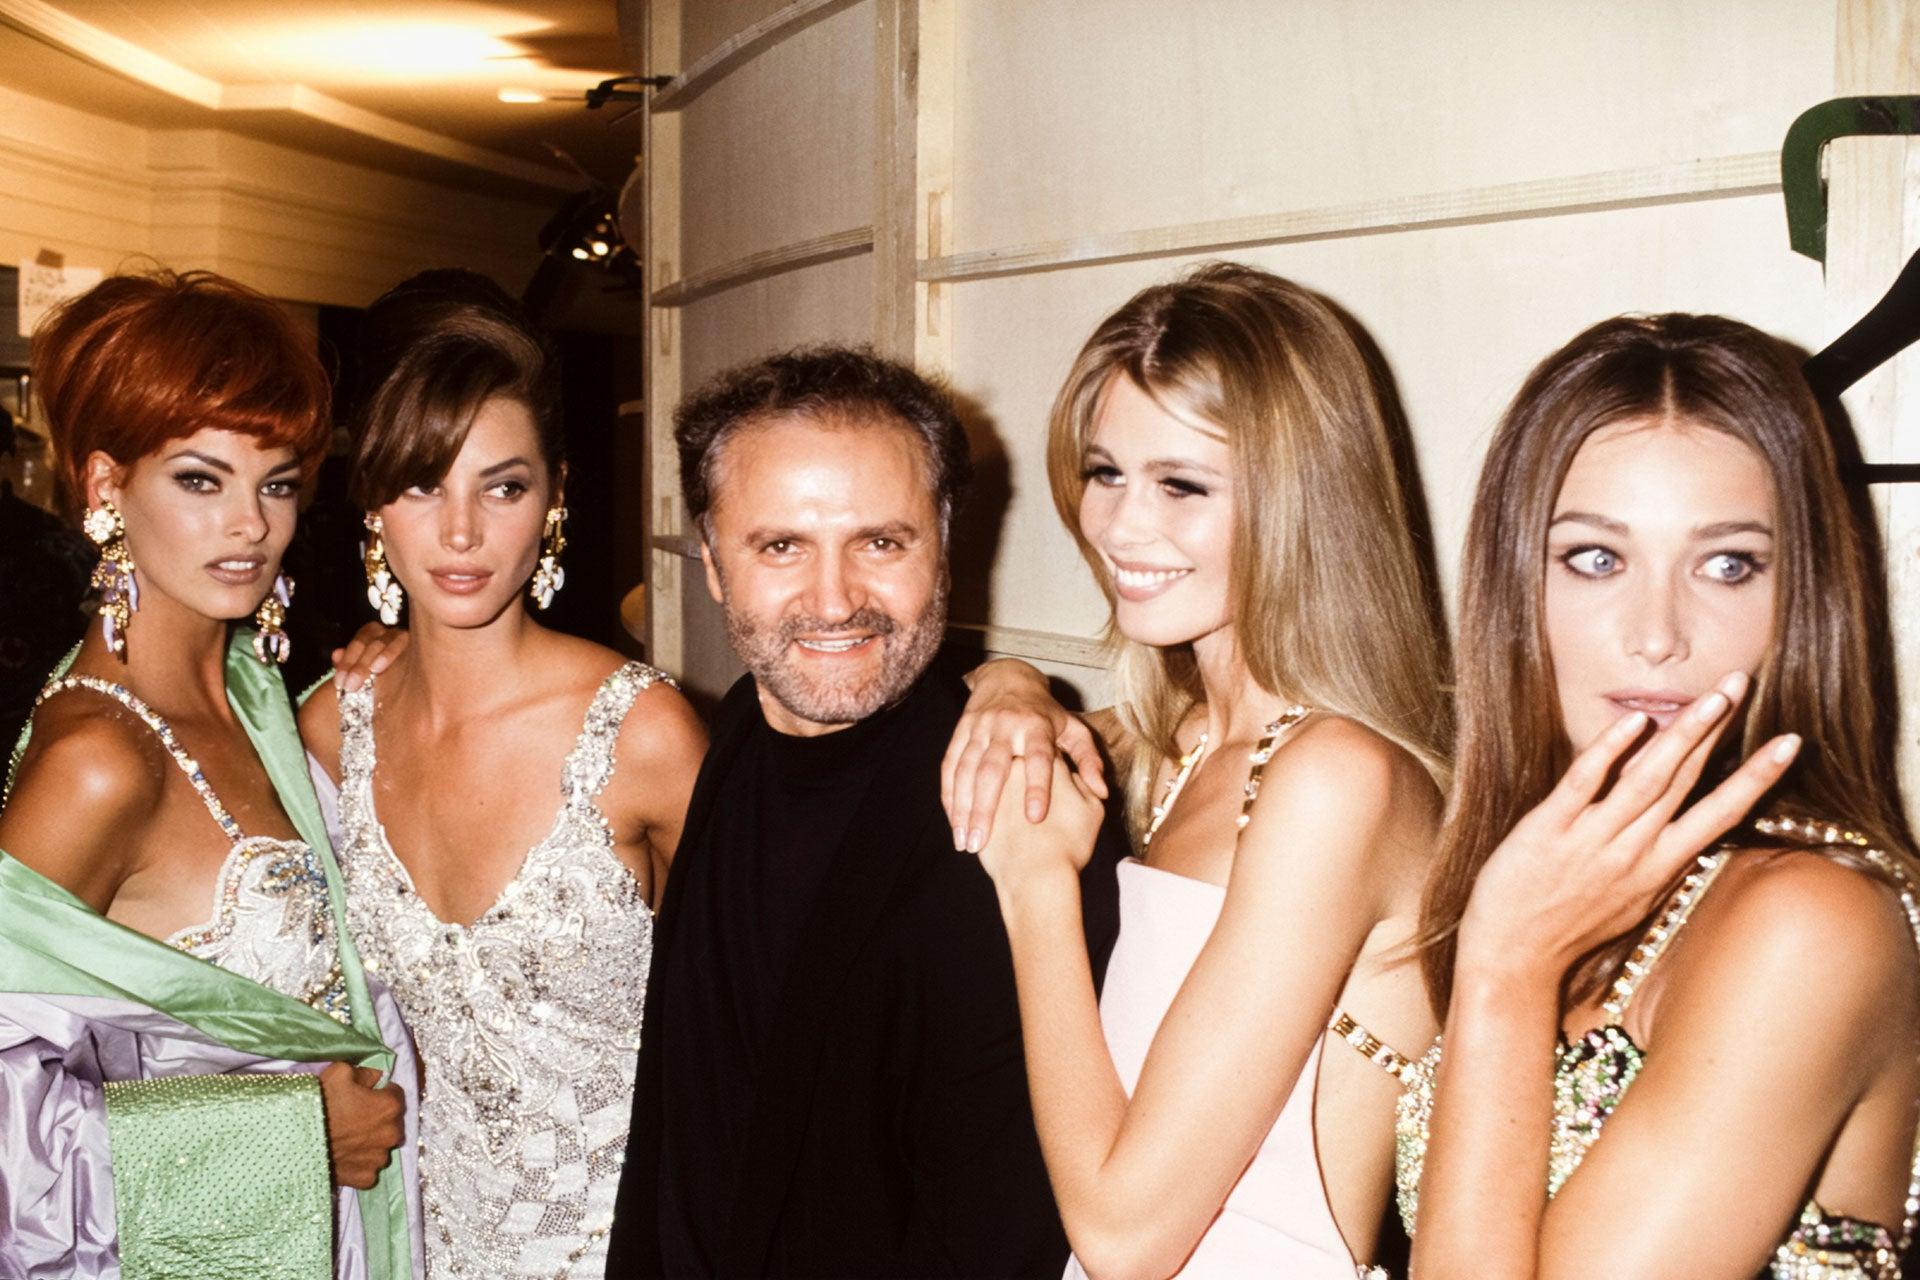 Gianni Versace a Linda Evangelista, Christy Turlington, Claudia Schiffer a Carla Bruni v Paříži, haute couture kolekce Versace AW91/92 Autor: PAT/ARNAL/Gamma-Rapho via Getty Images